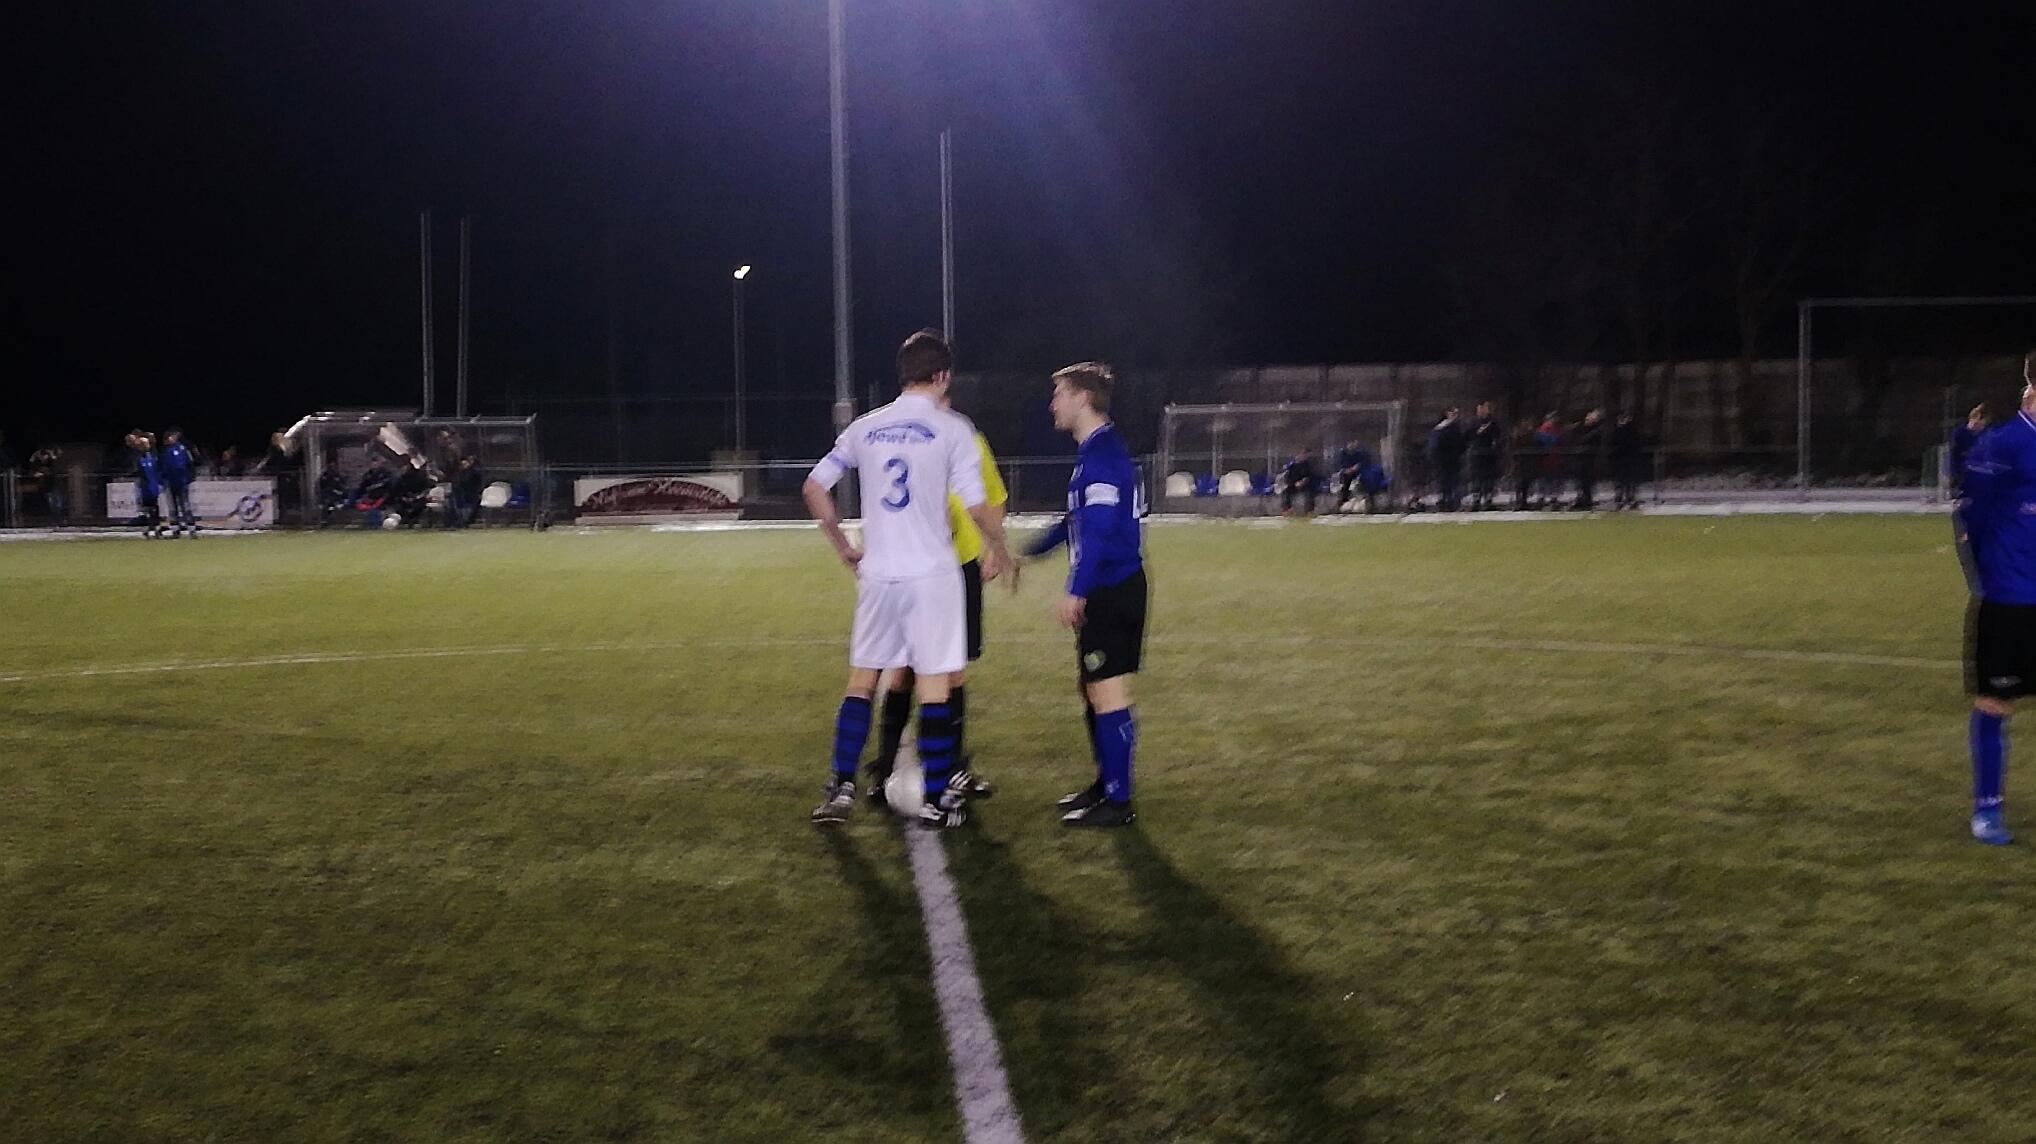 RCH - VEW - Voetbal in Haarlem